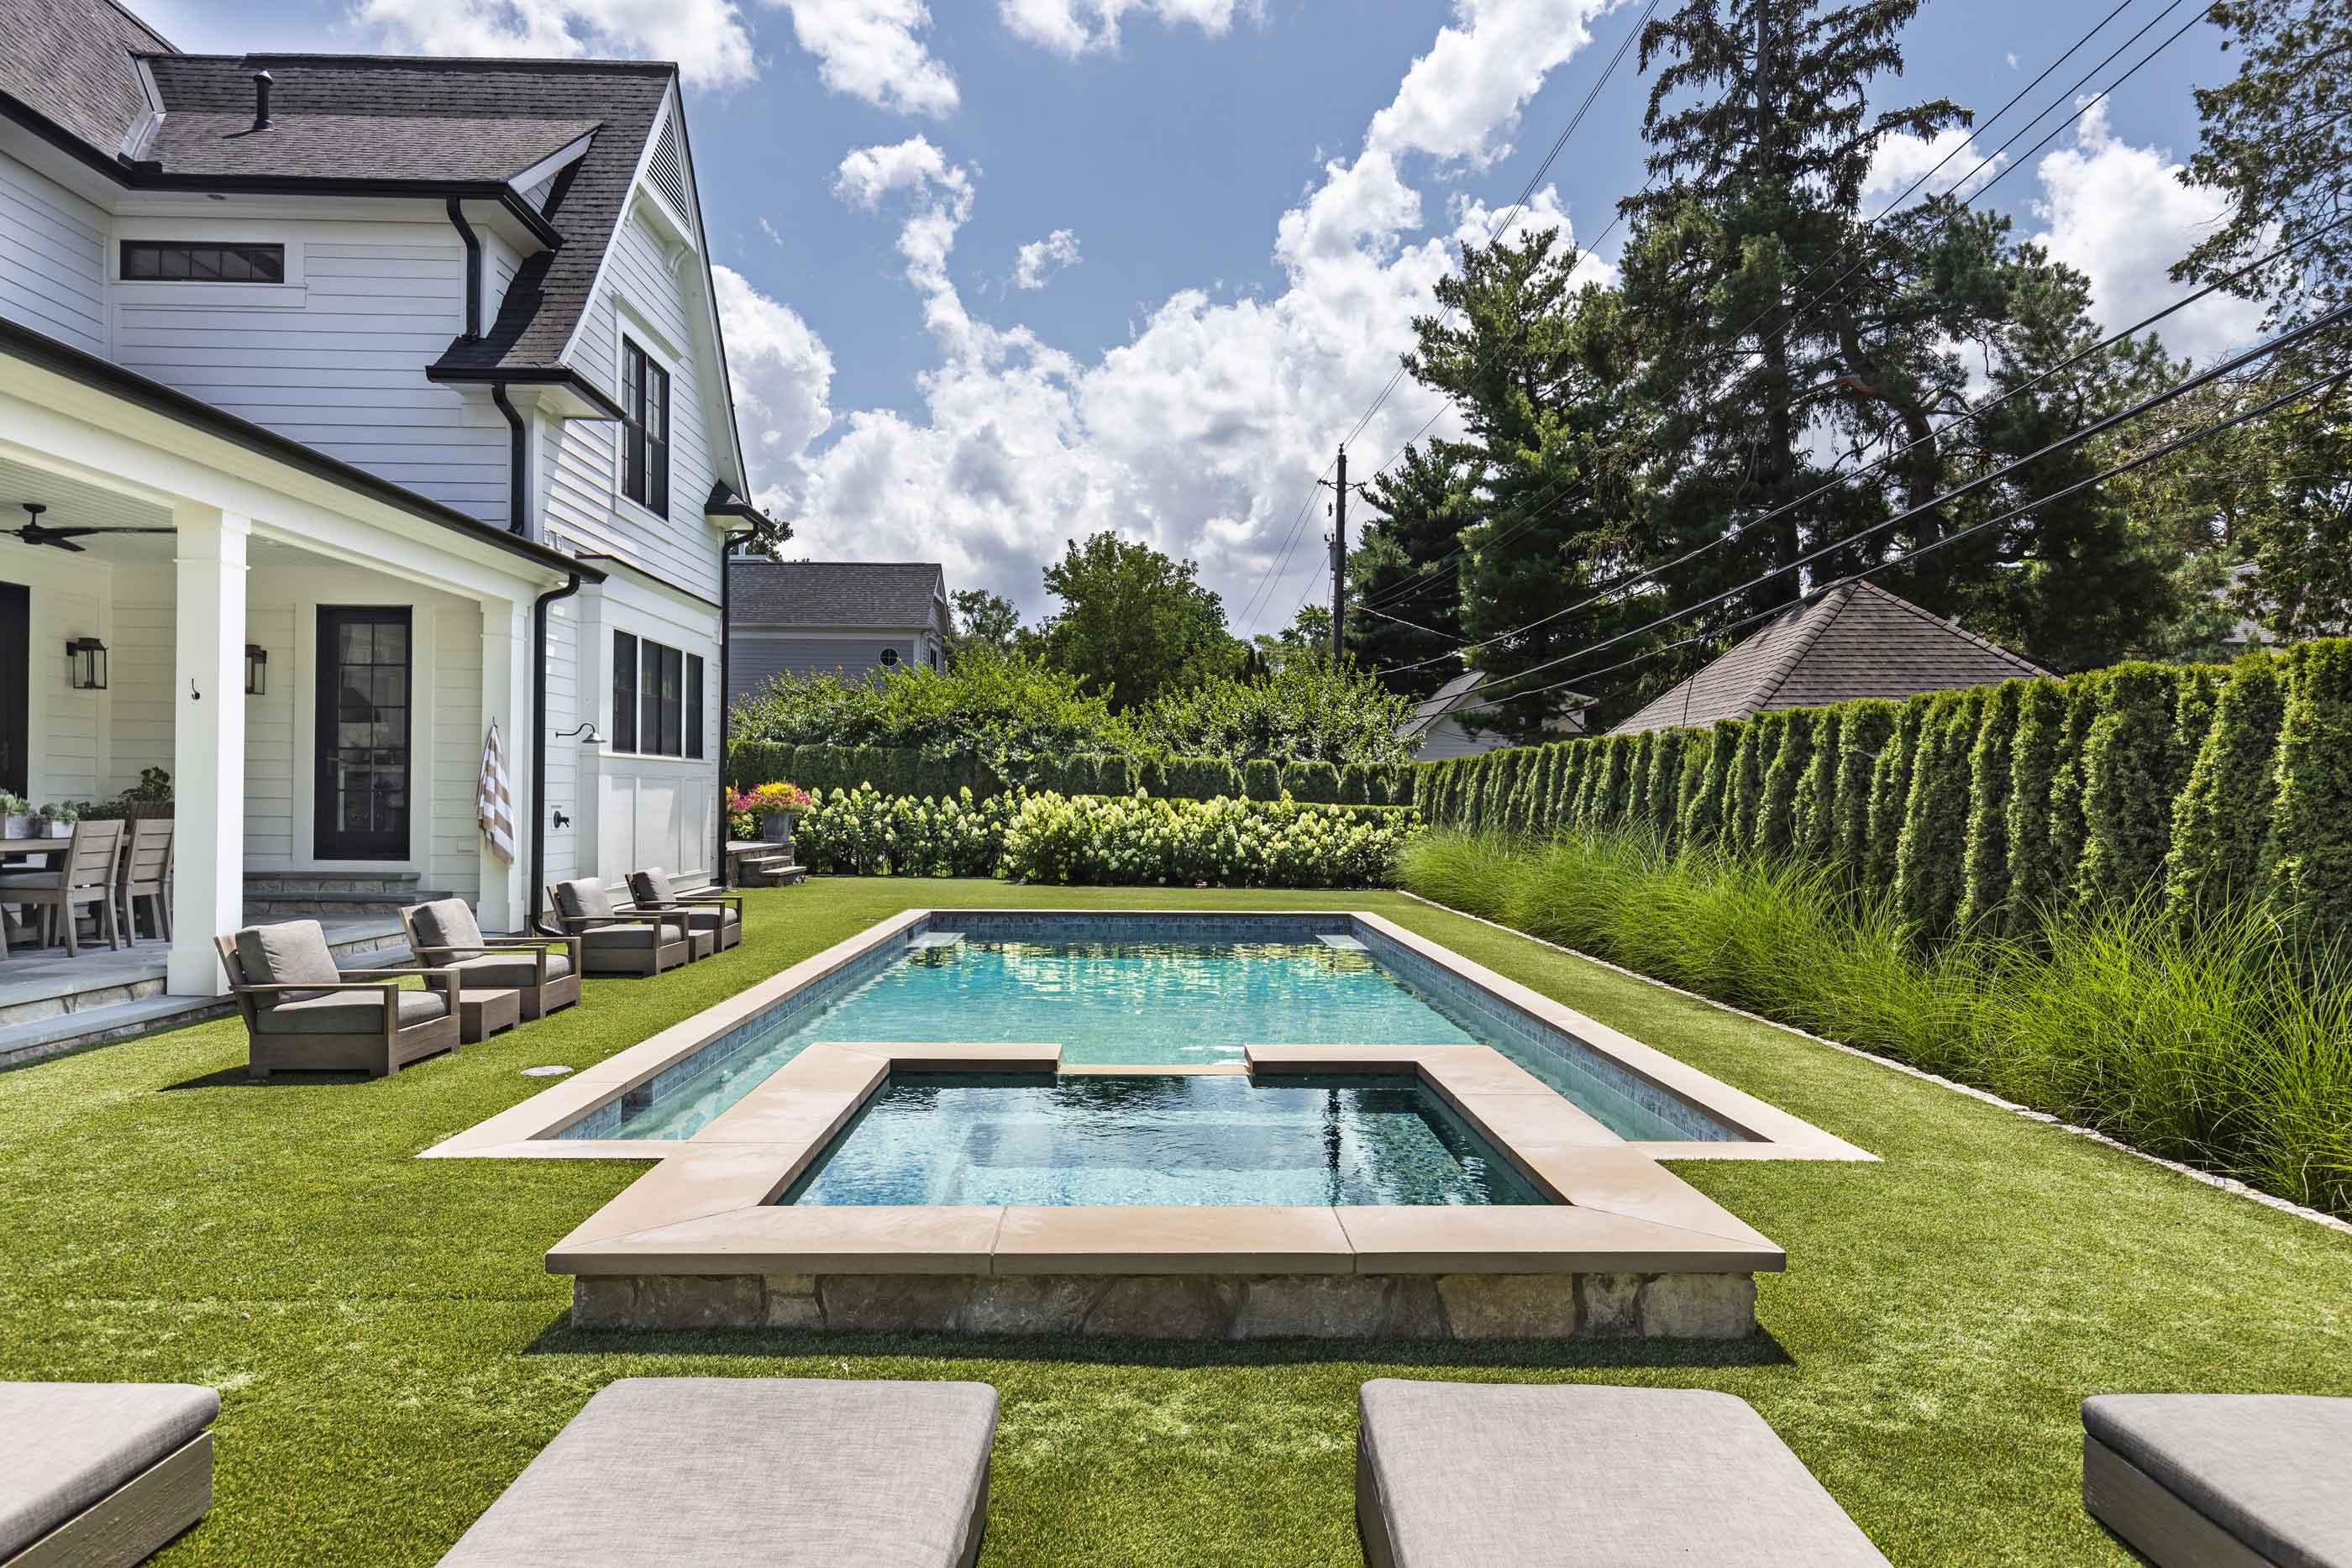 Larchlea pool and backyard